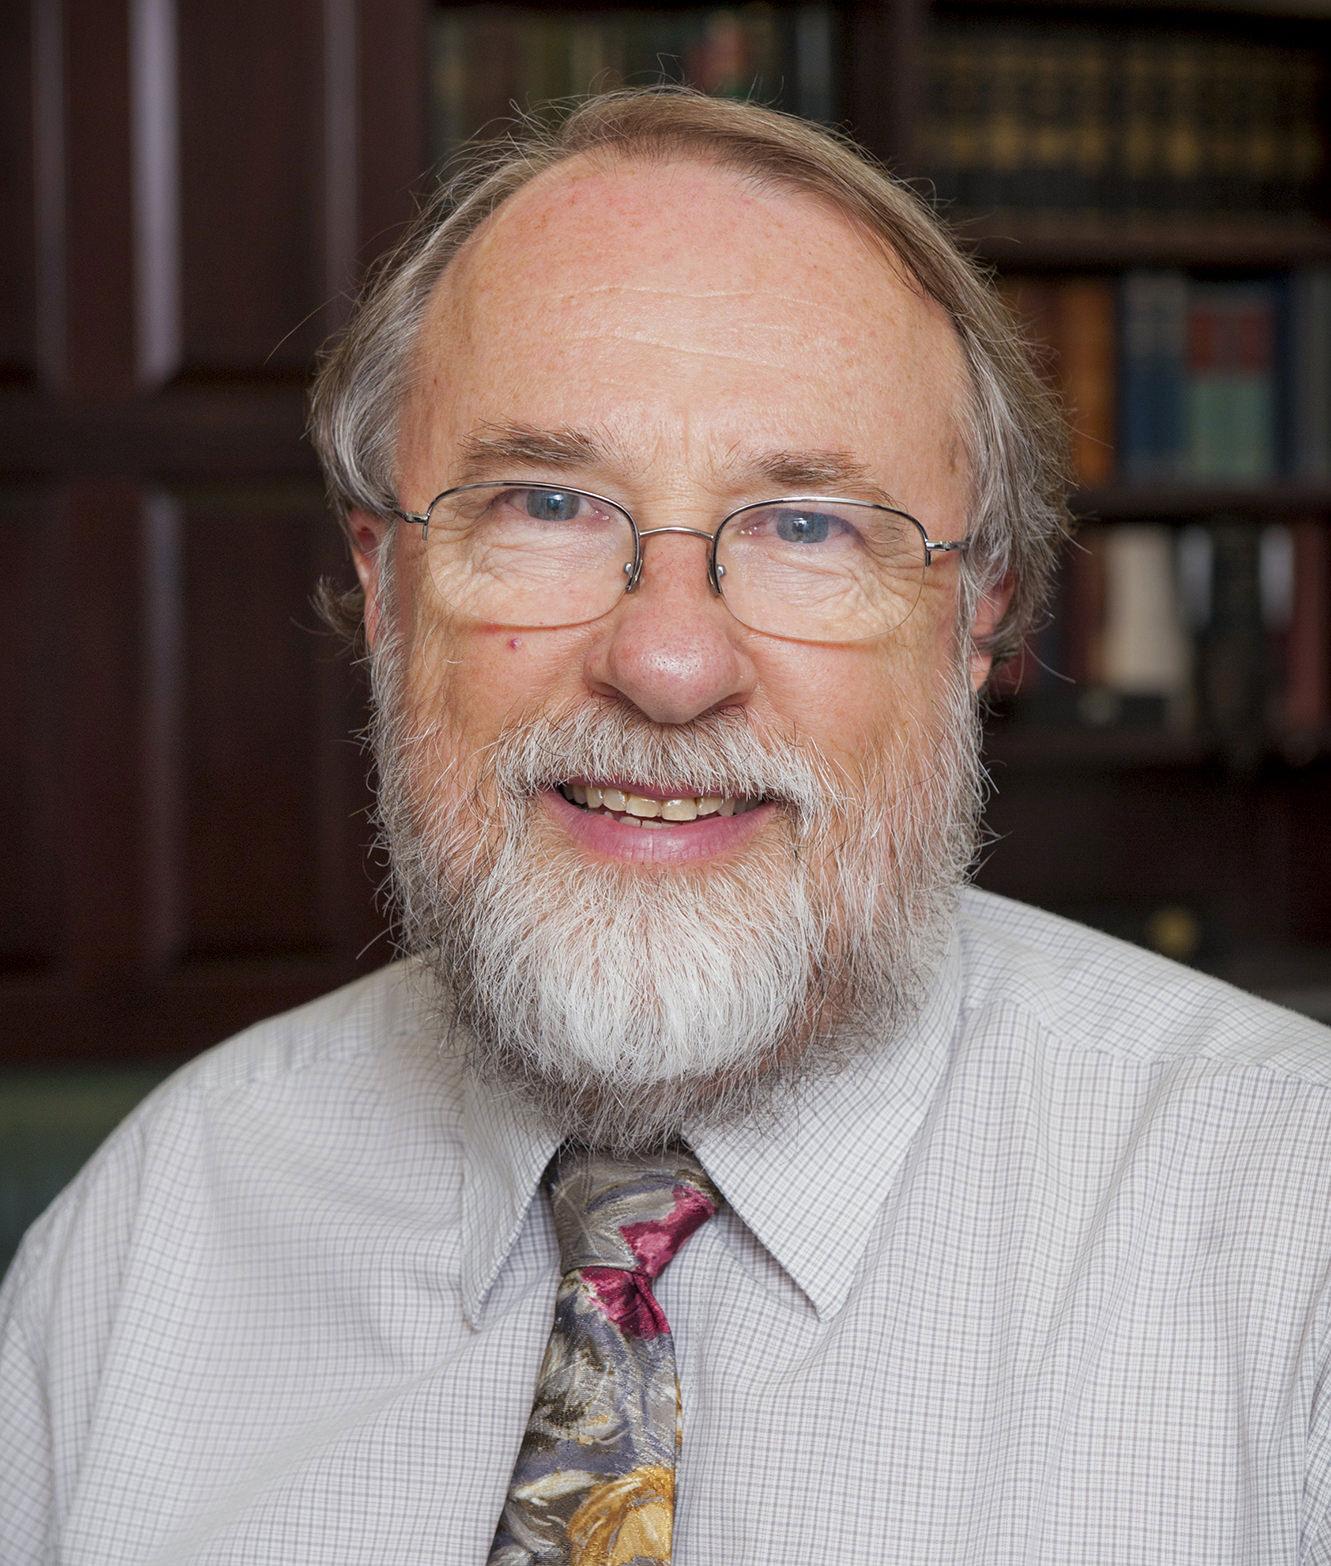 Dr Jim Leeper